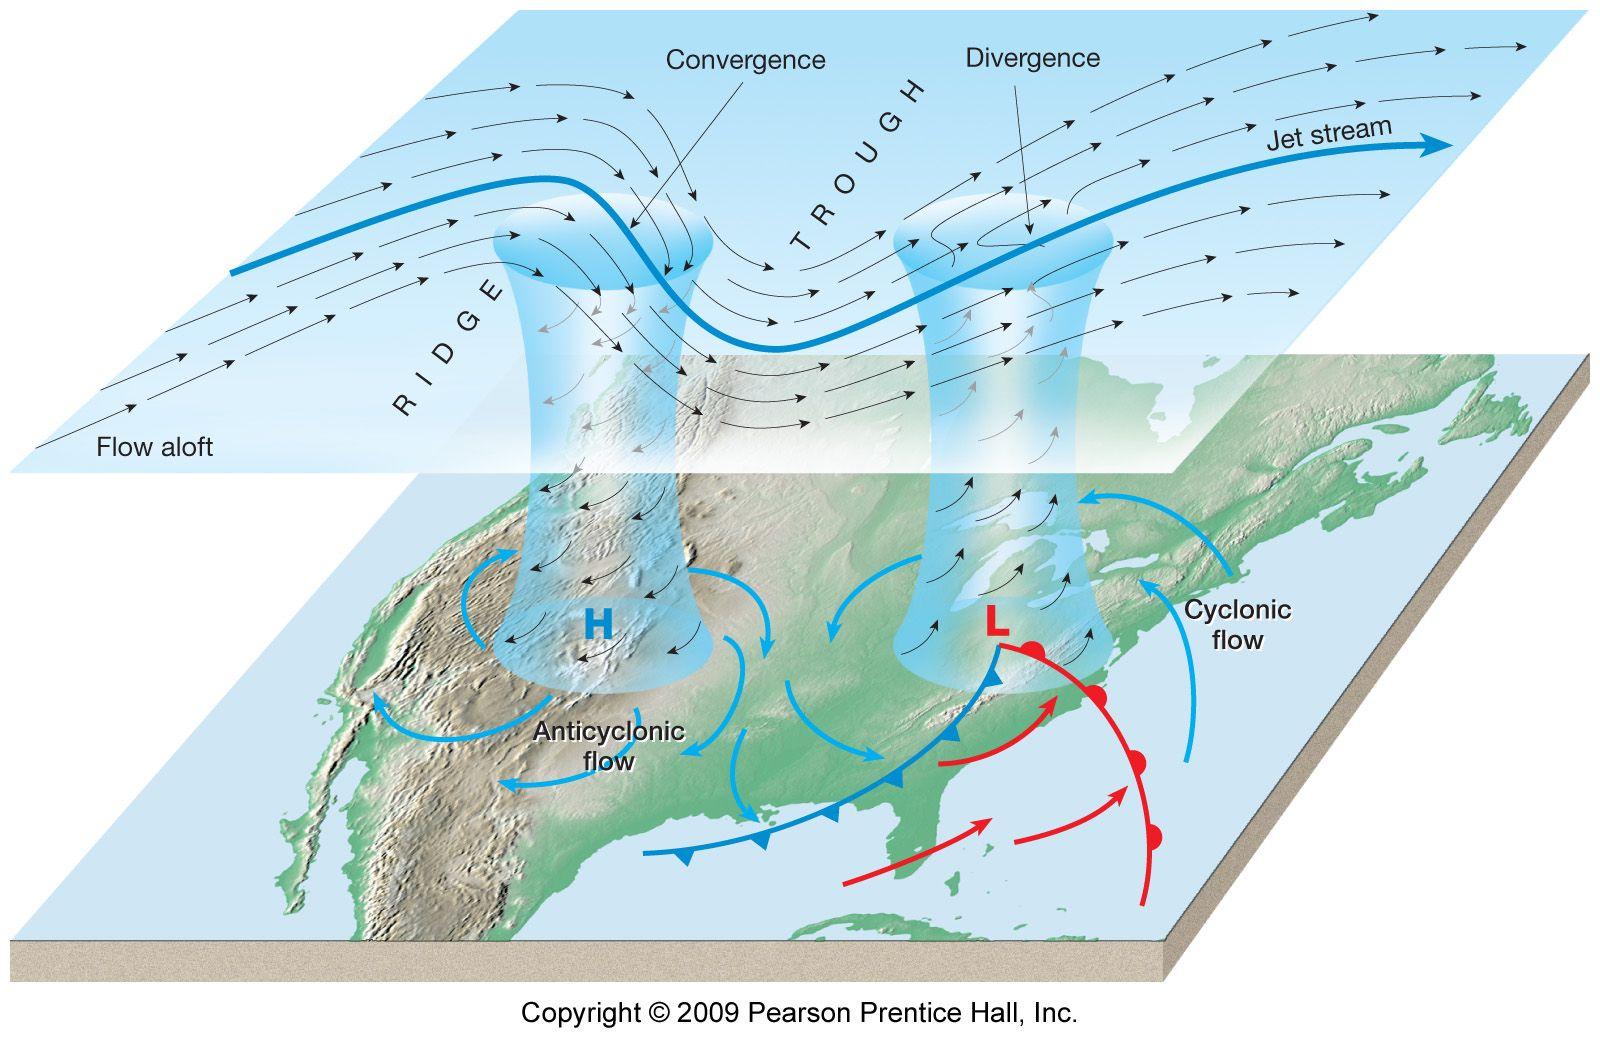 Pin By Steven Vassallo On Atmospheric Science